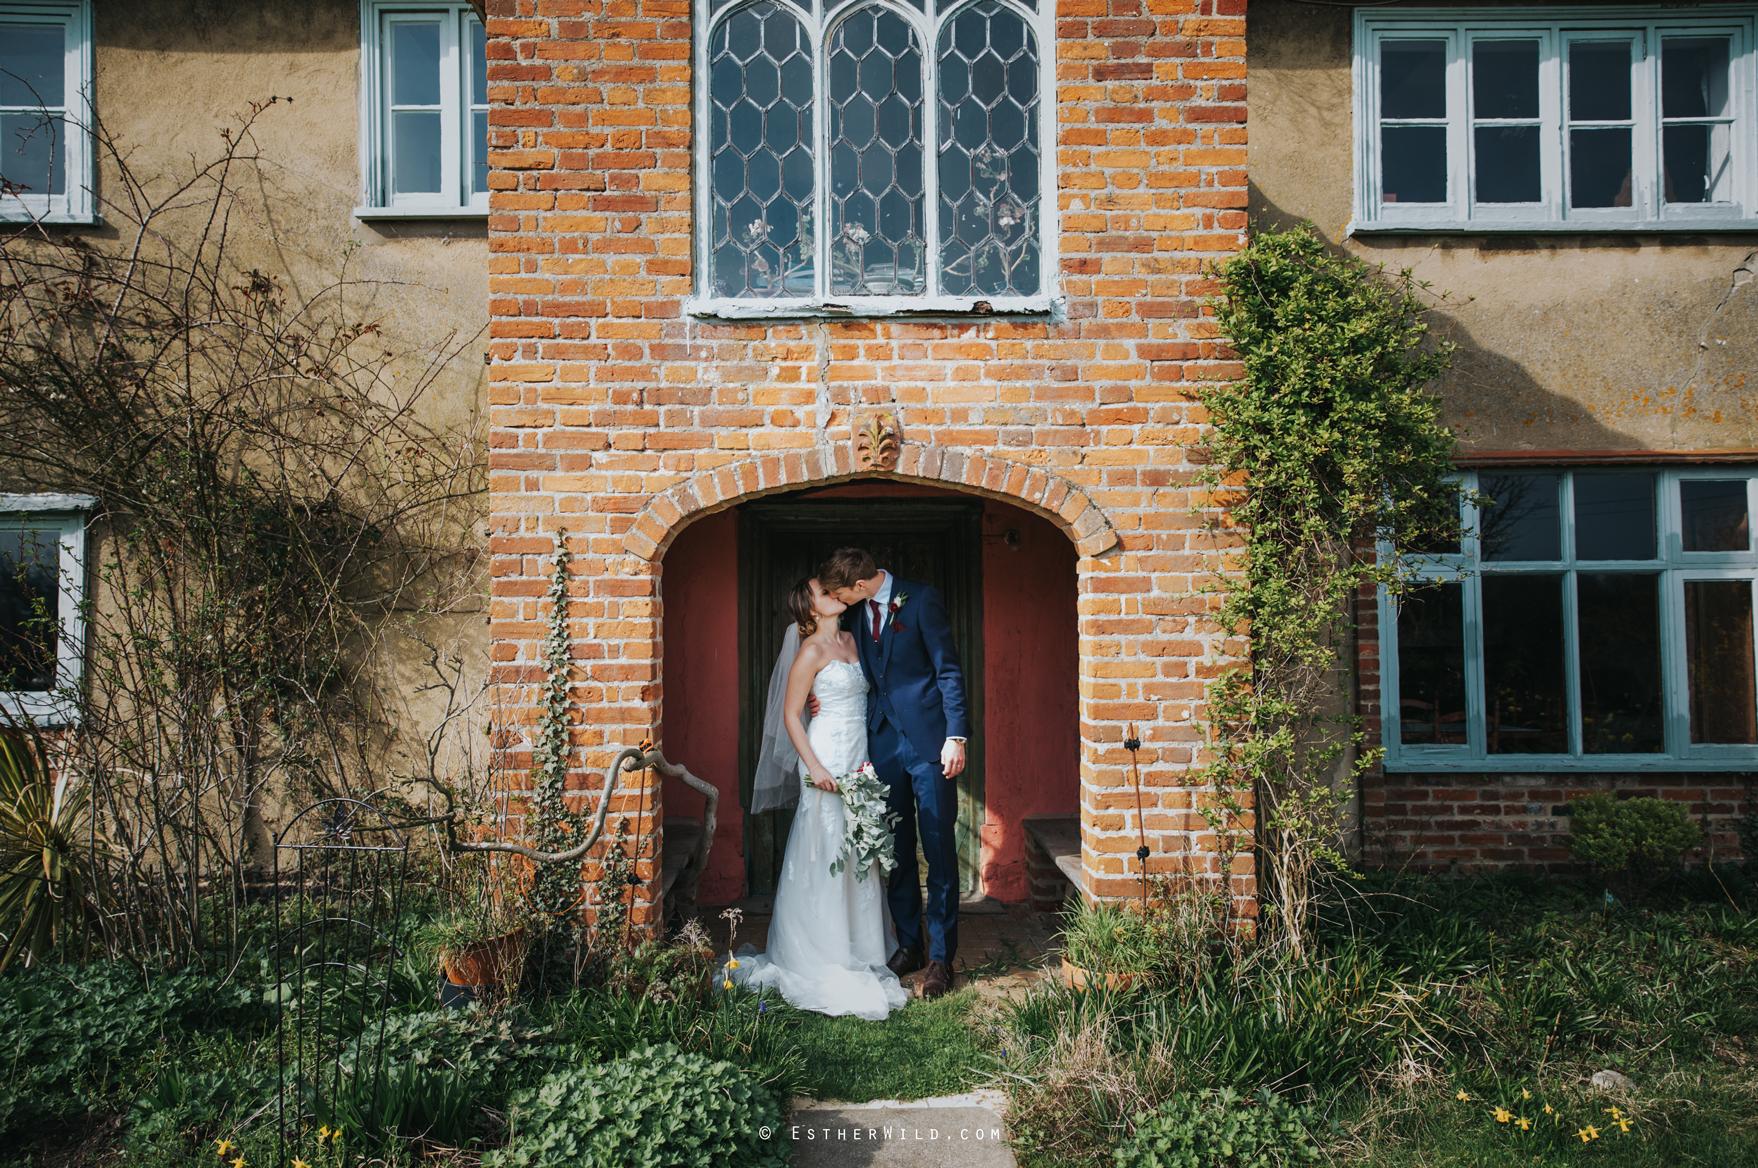 Glebe_Farm_Barn_Rustic_Norfolk_Wedding_Esther_Wild_Photographer_Copyright_IMG_1592.jpg